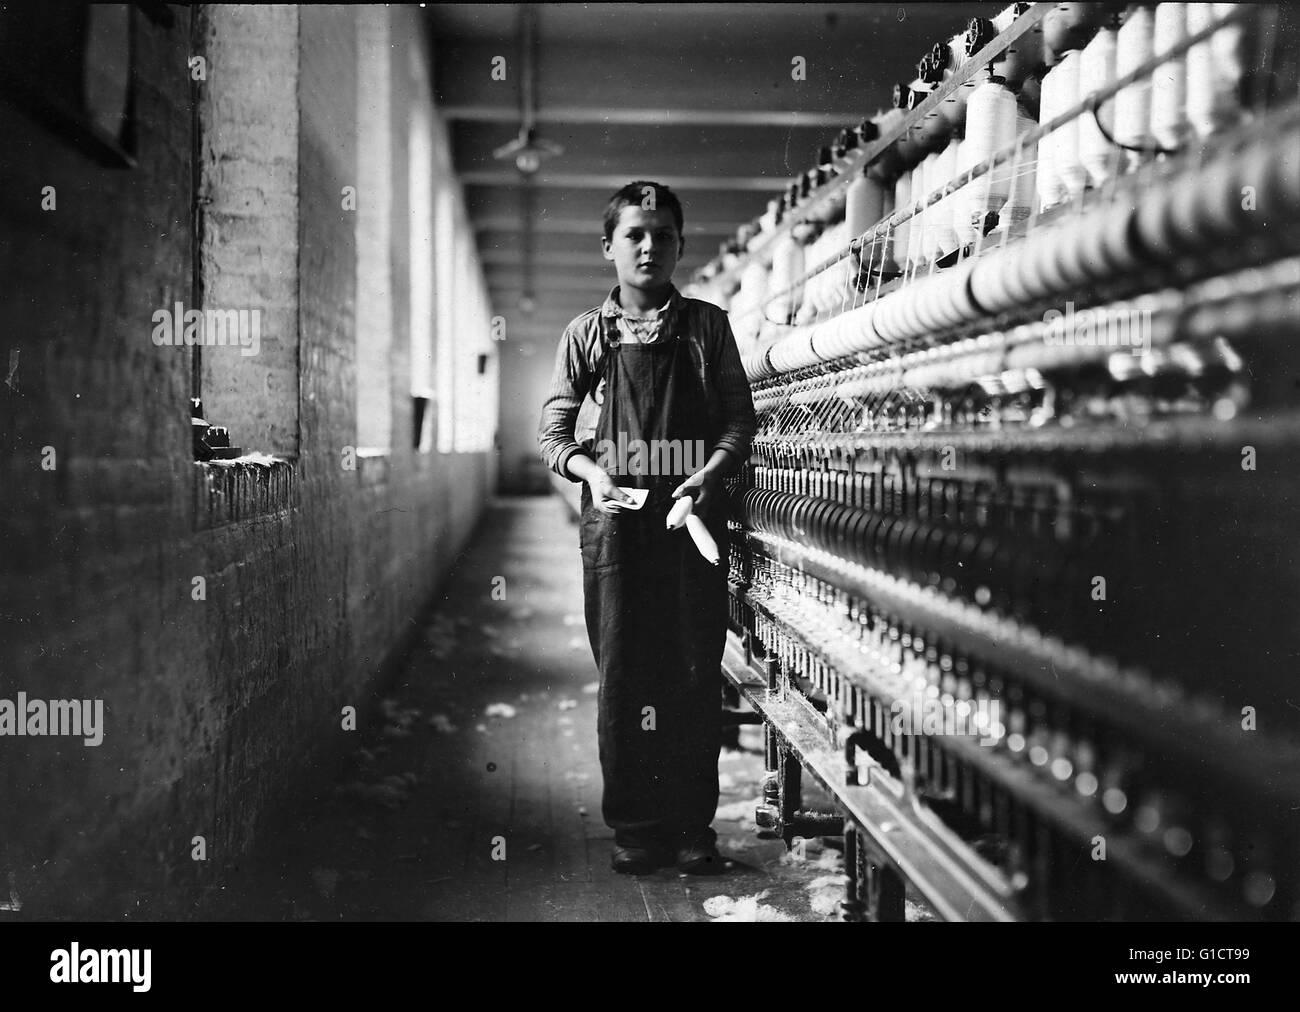 Tony Soccha; a textile mill worker (Bobbin boy) aged 11 Chicopee; Massachusetts; Usa 1910 - Stock Image